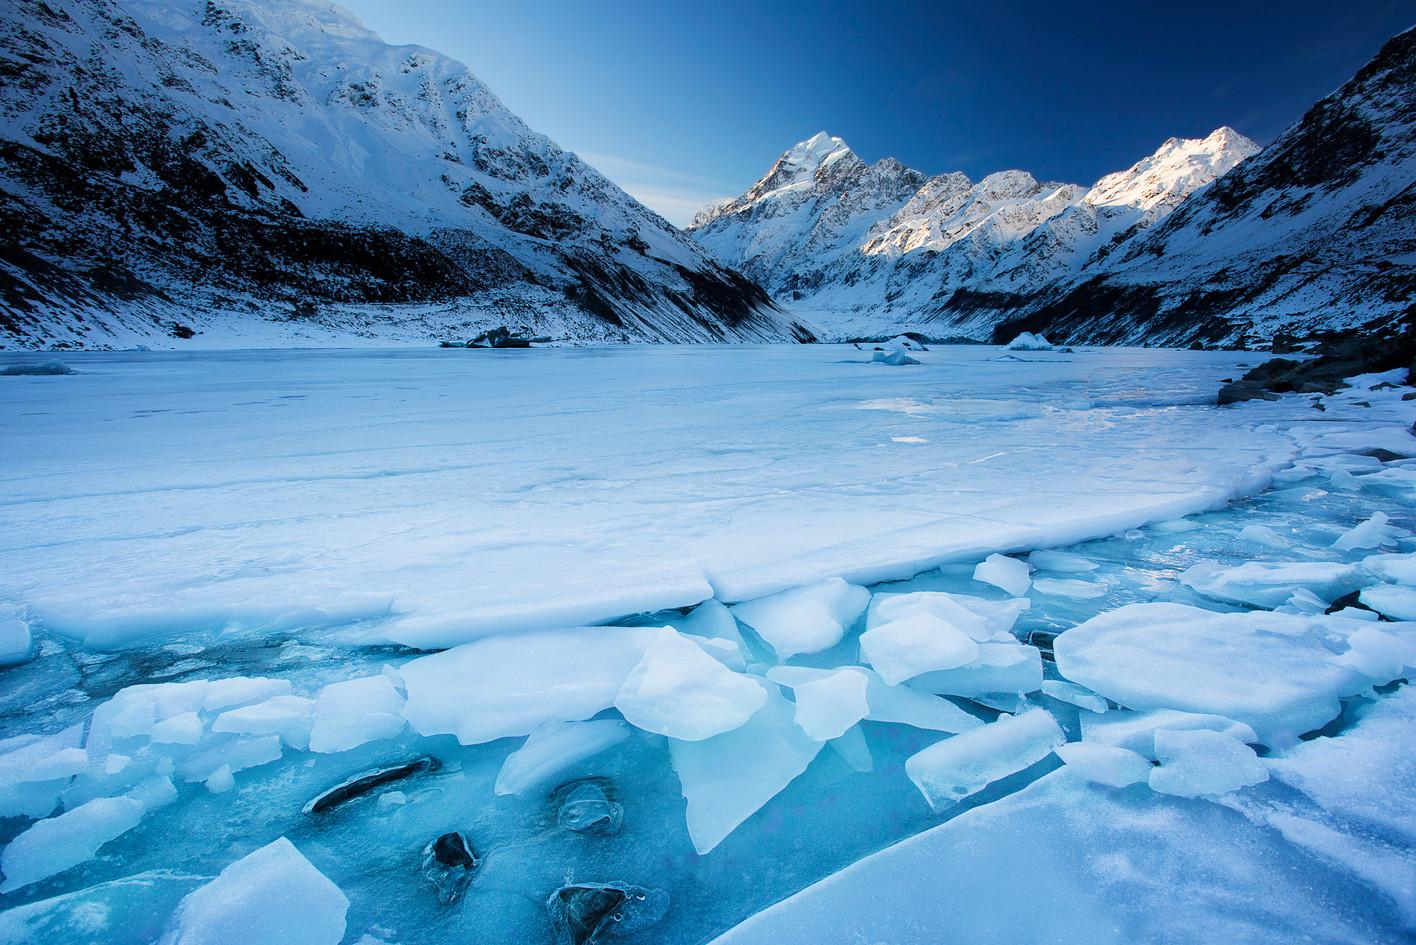 Mount Cook presides over a frozen Hooker Lake